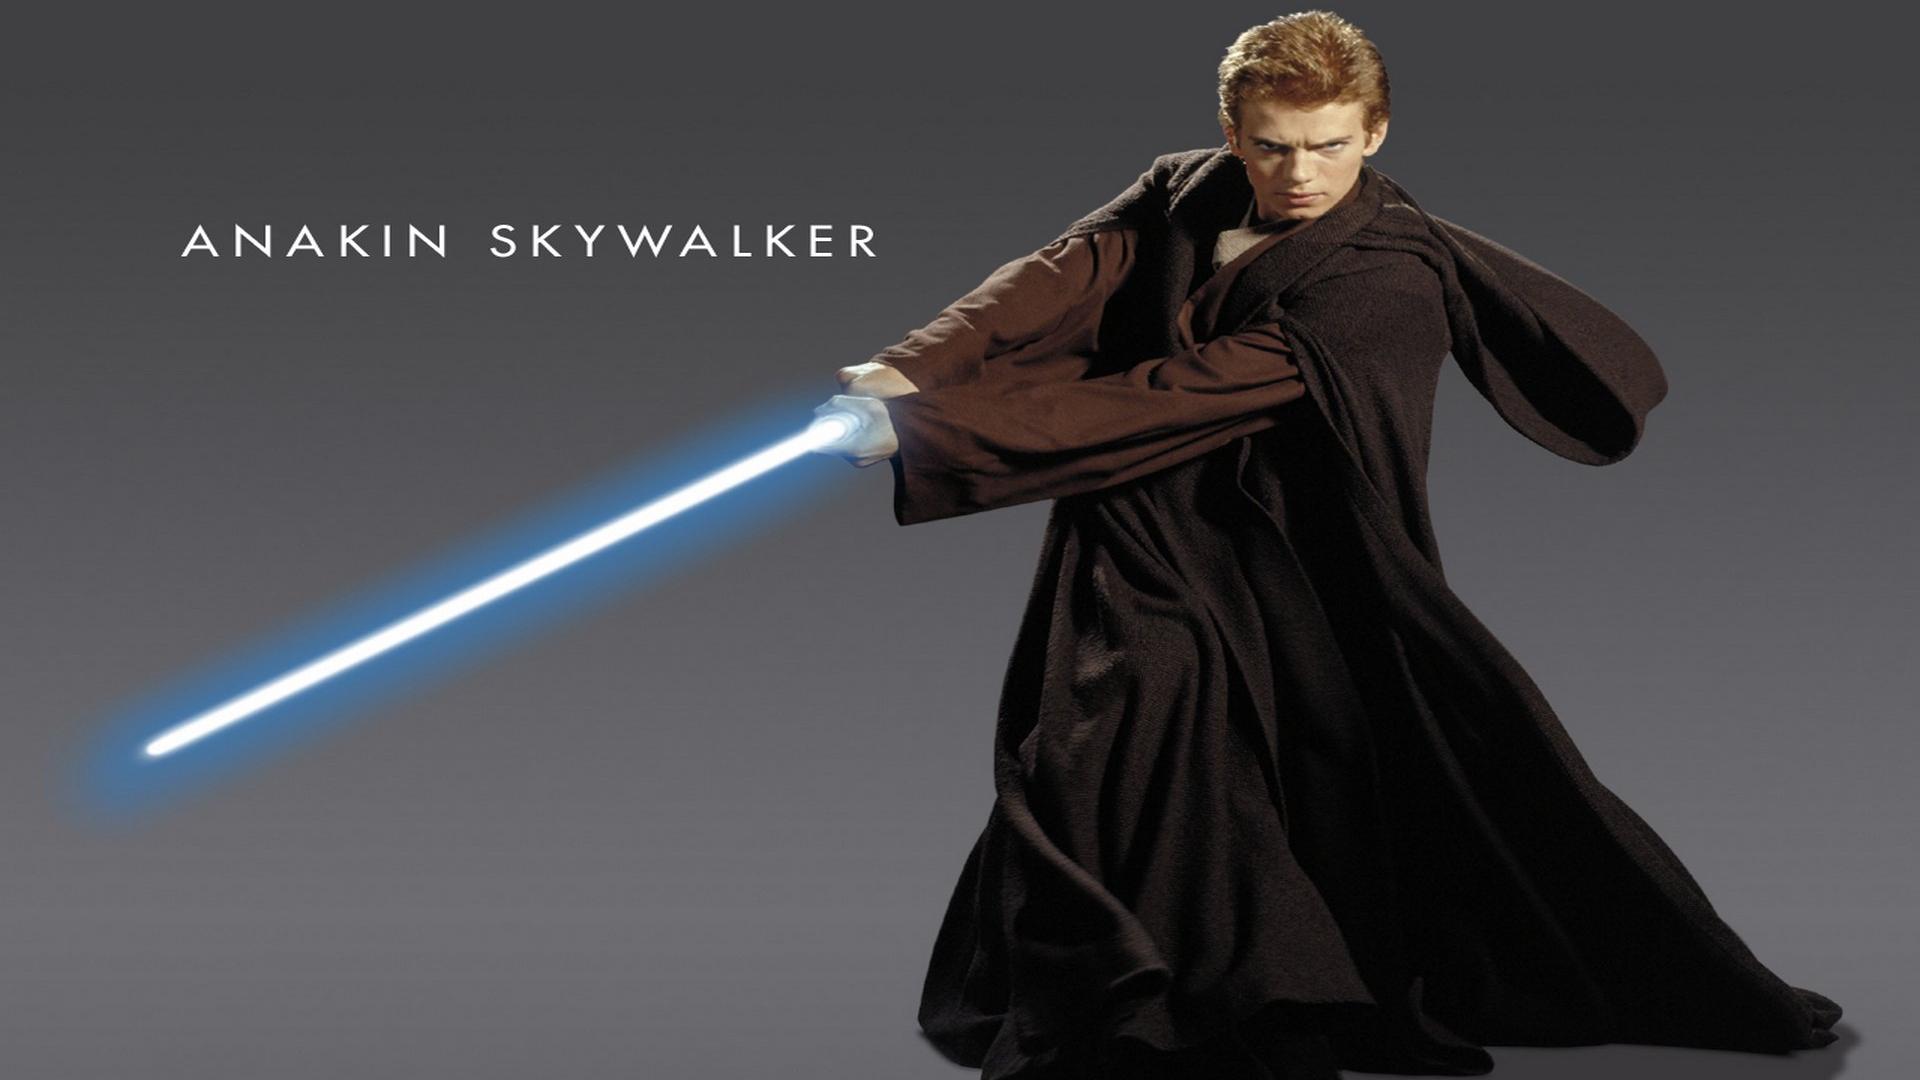 Anakin Skywalker Wallpaper For Desktop 1920x1200 Download Resolutions 1920x1080